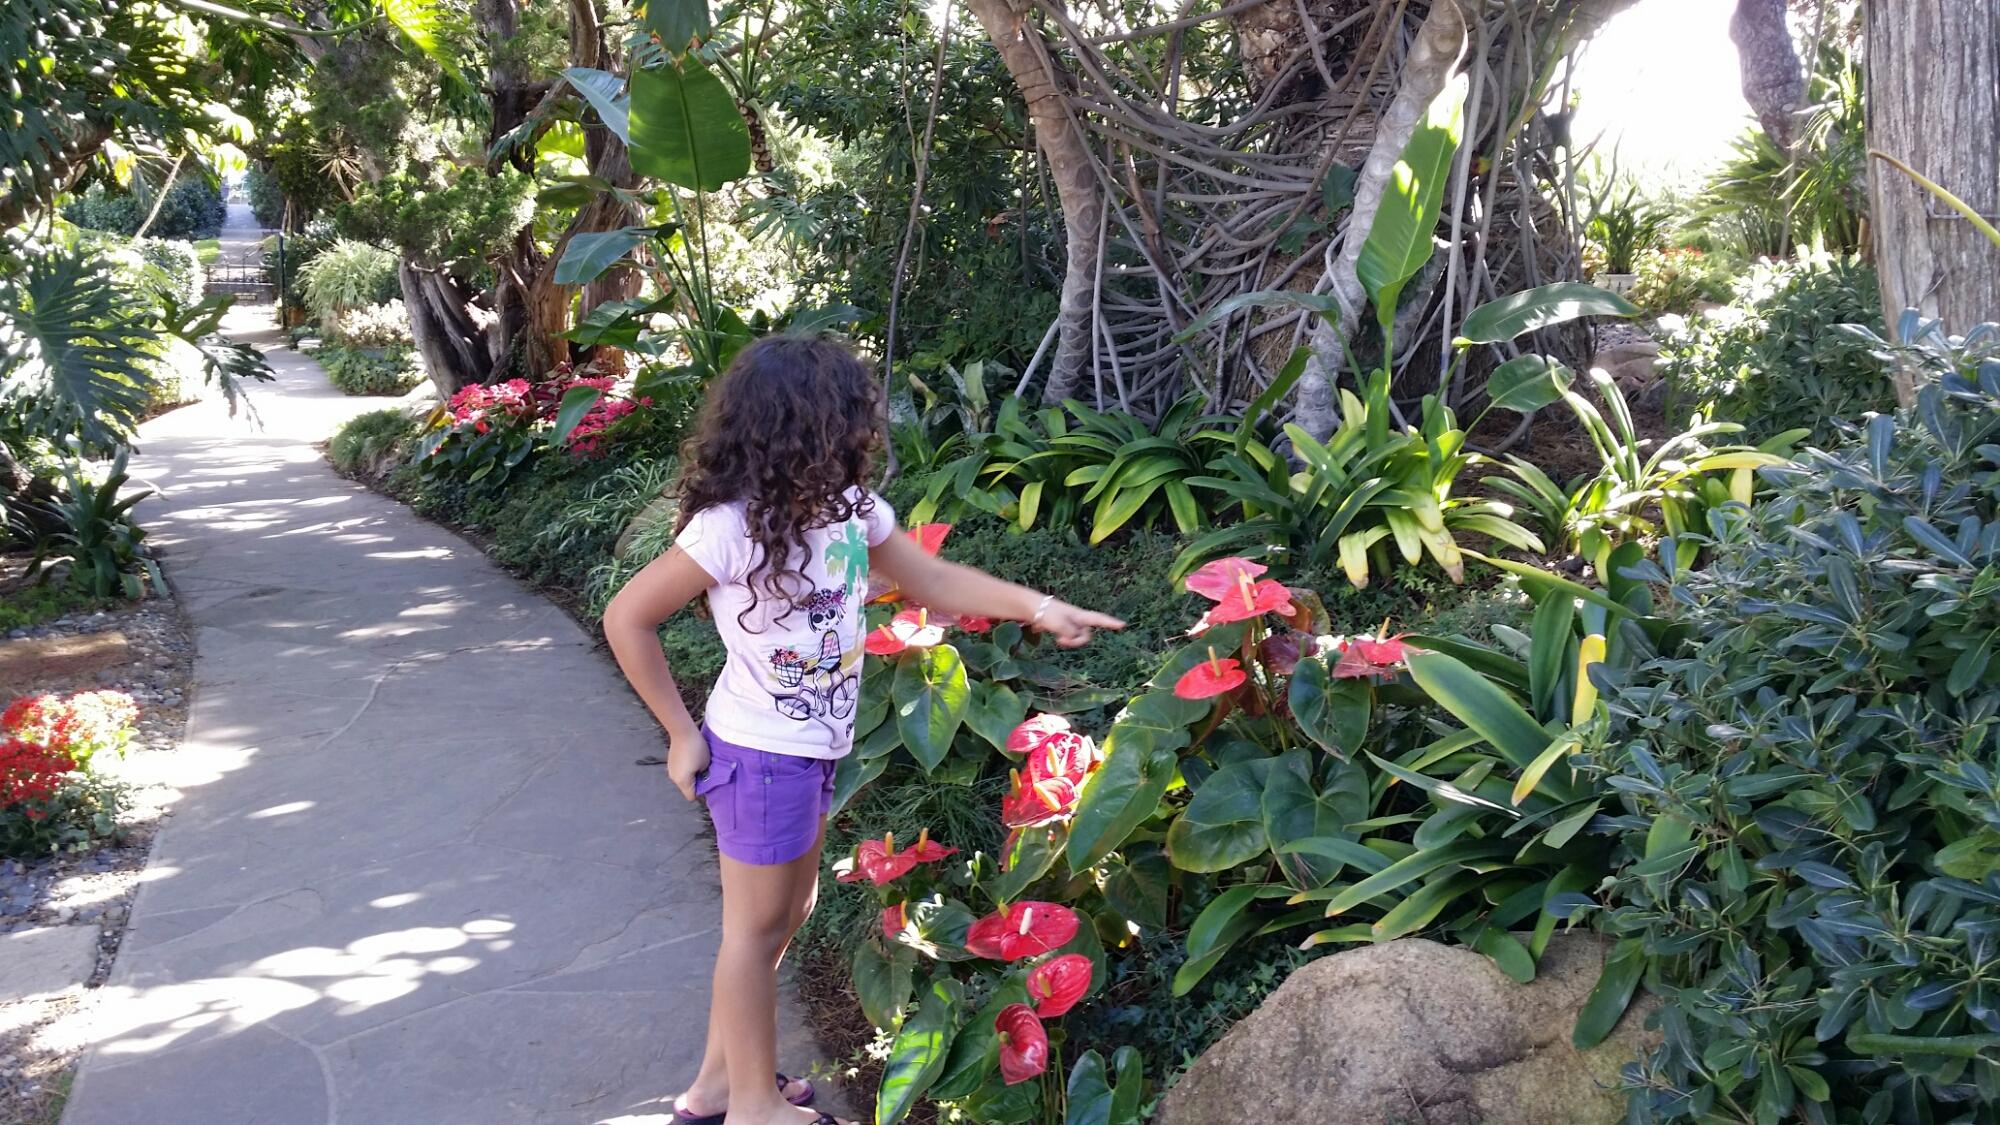 Paradise At Meditation Gardens In Encinitas Luchanik